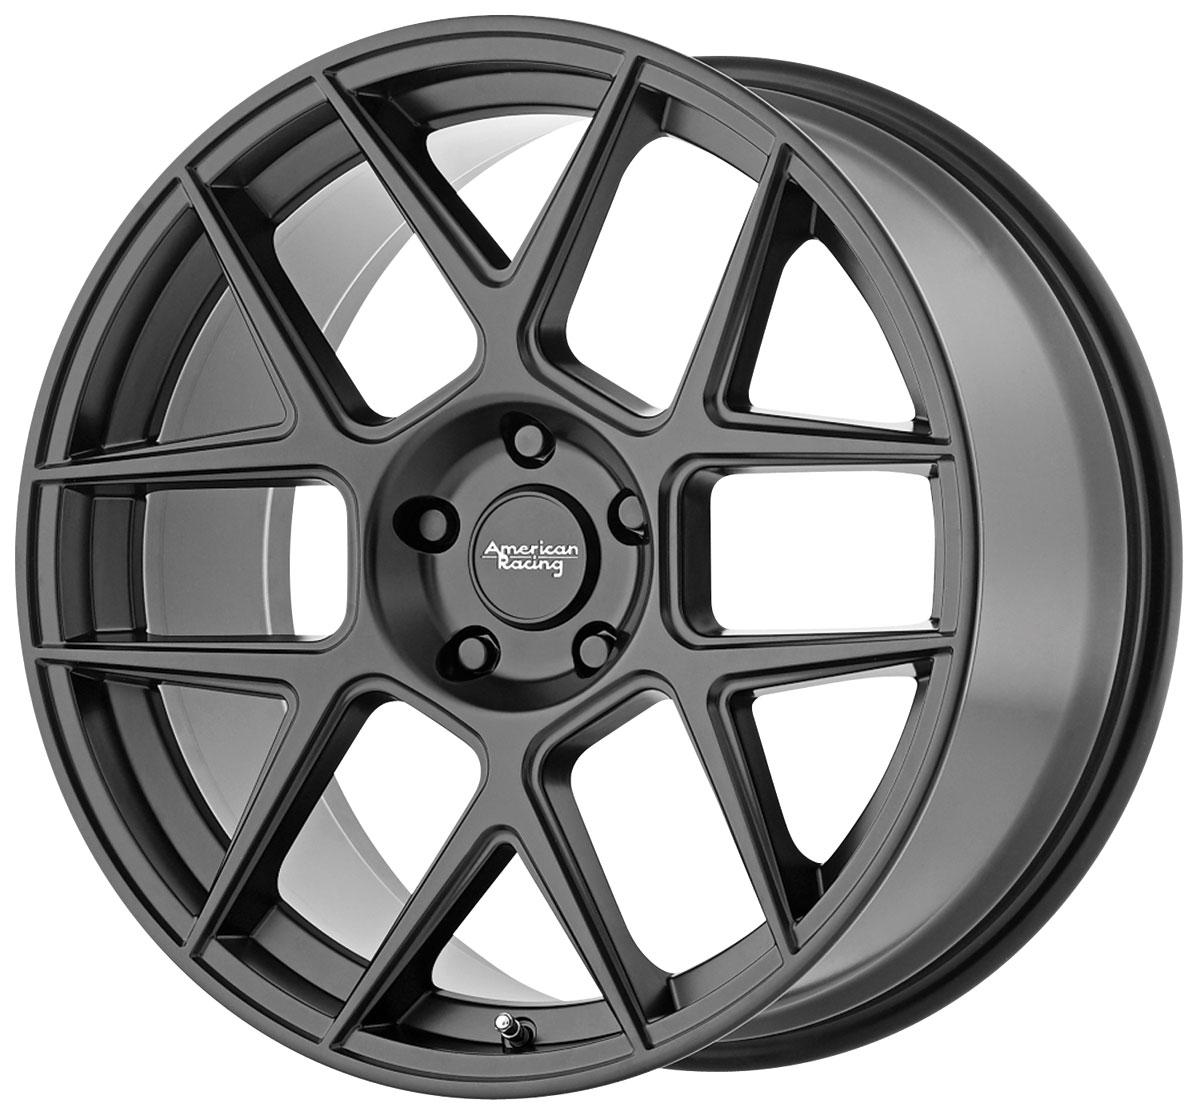 Wheel, American Racing, APEX, 2016-19 CTS/CTS-V, 20x9